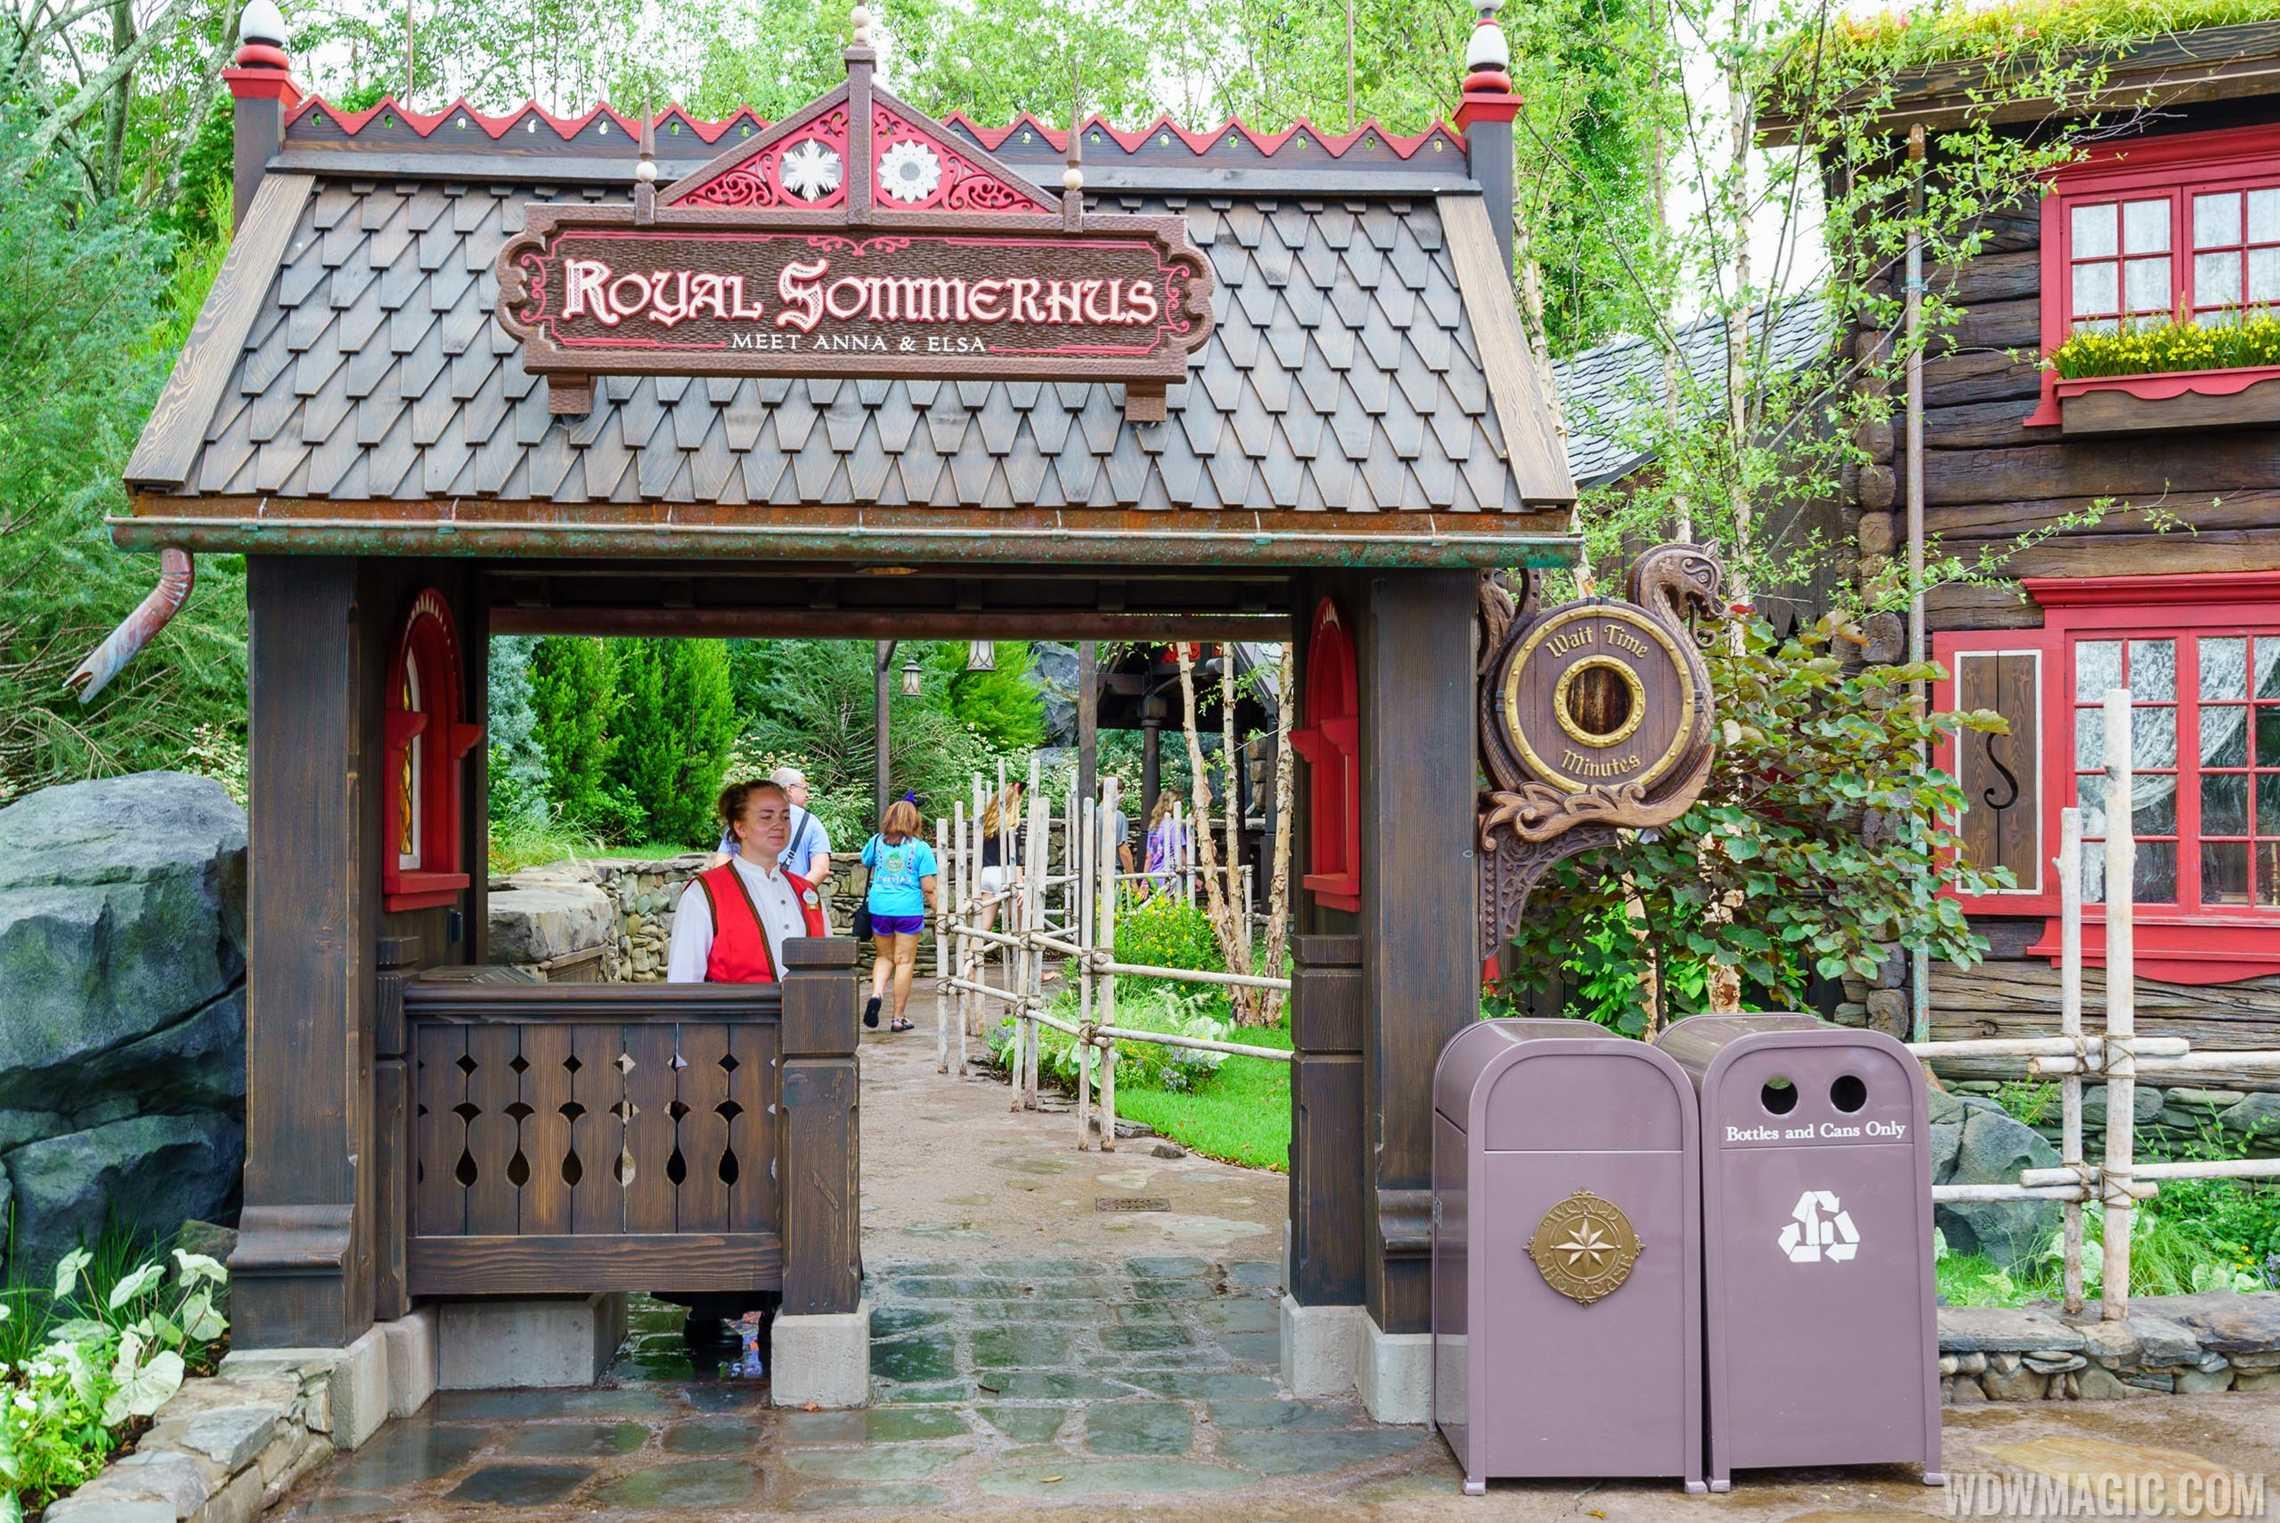 Royal Sommerhus entry